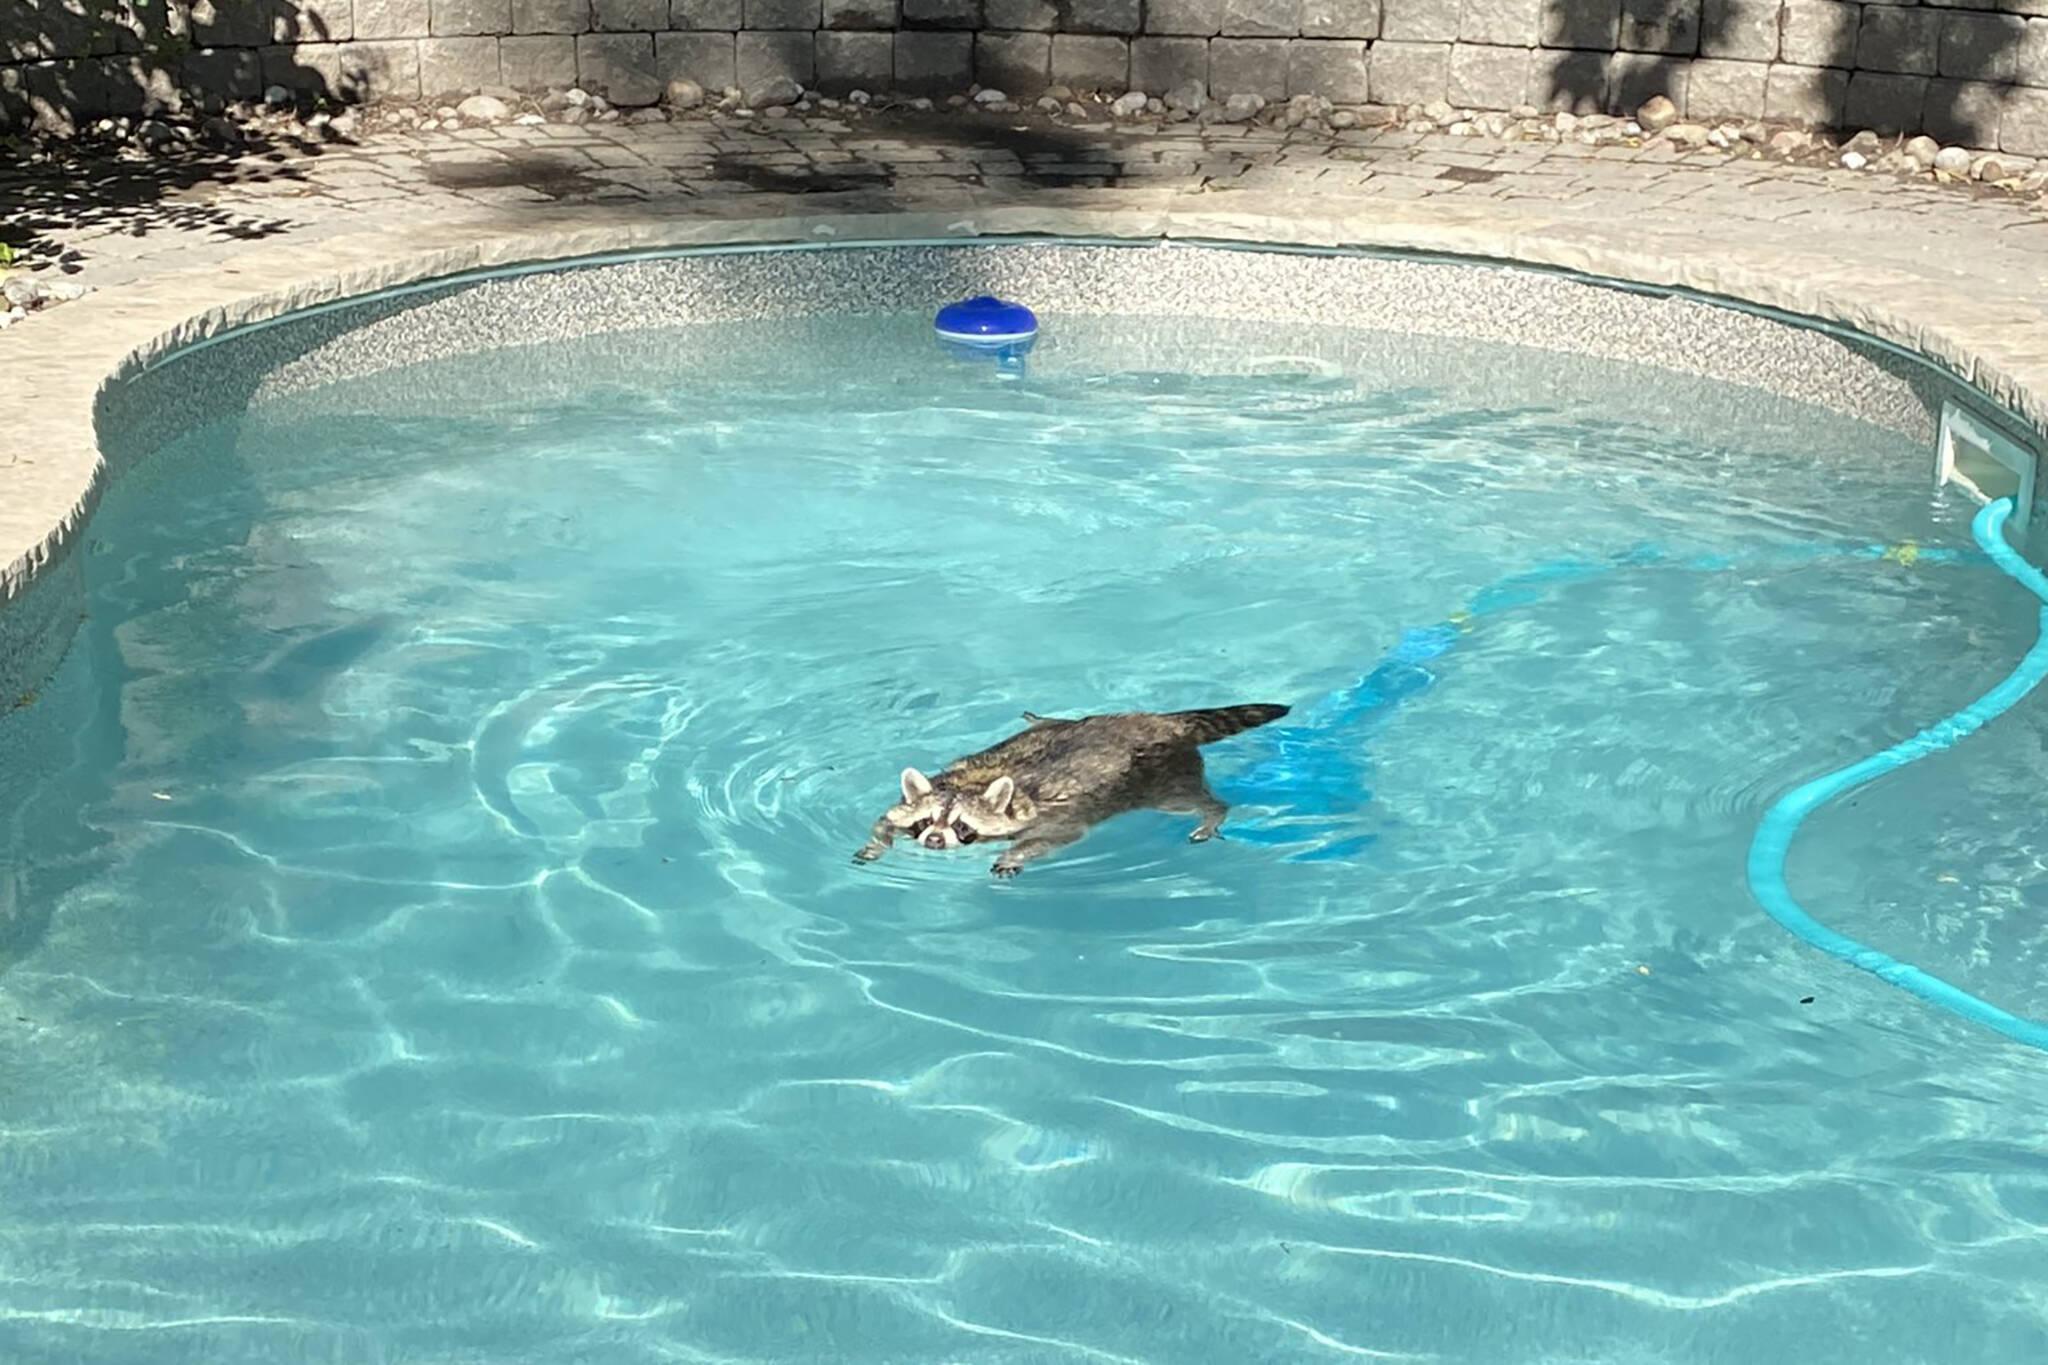 toronto raccoon swimming